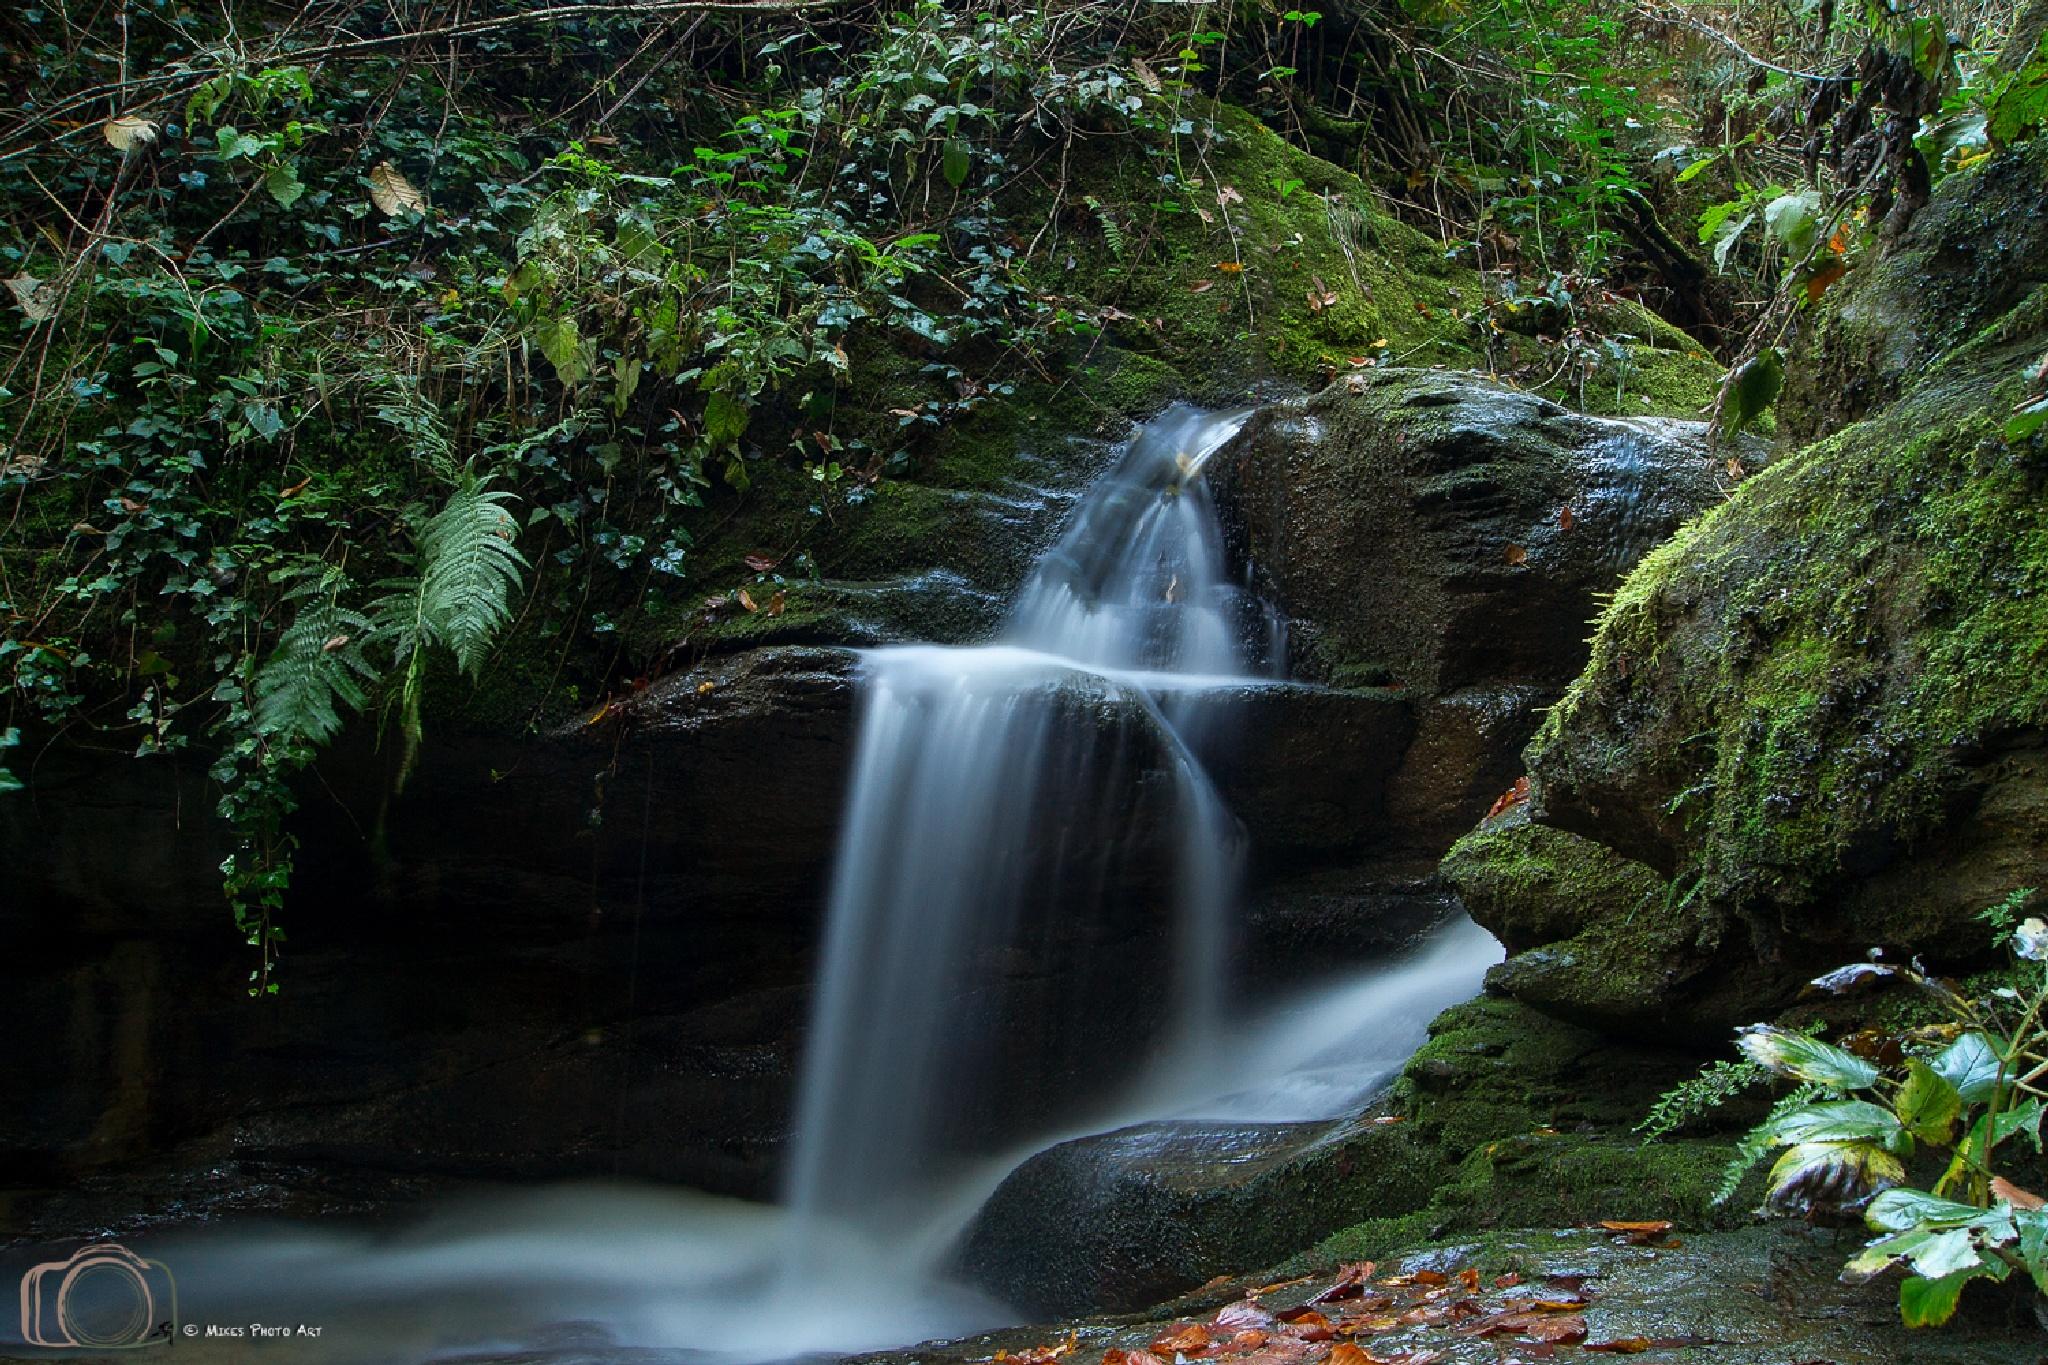 Waterfall by Michael Suppan